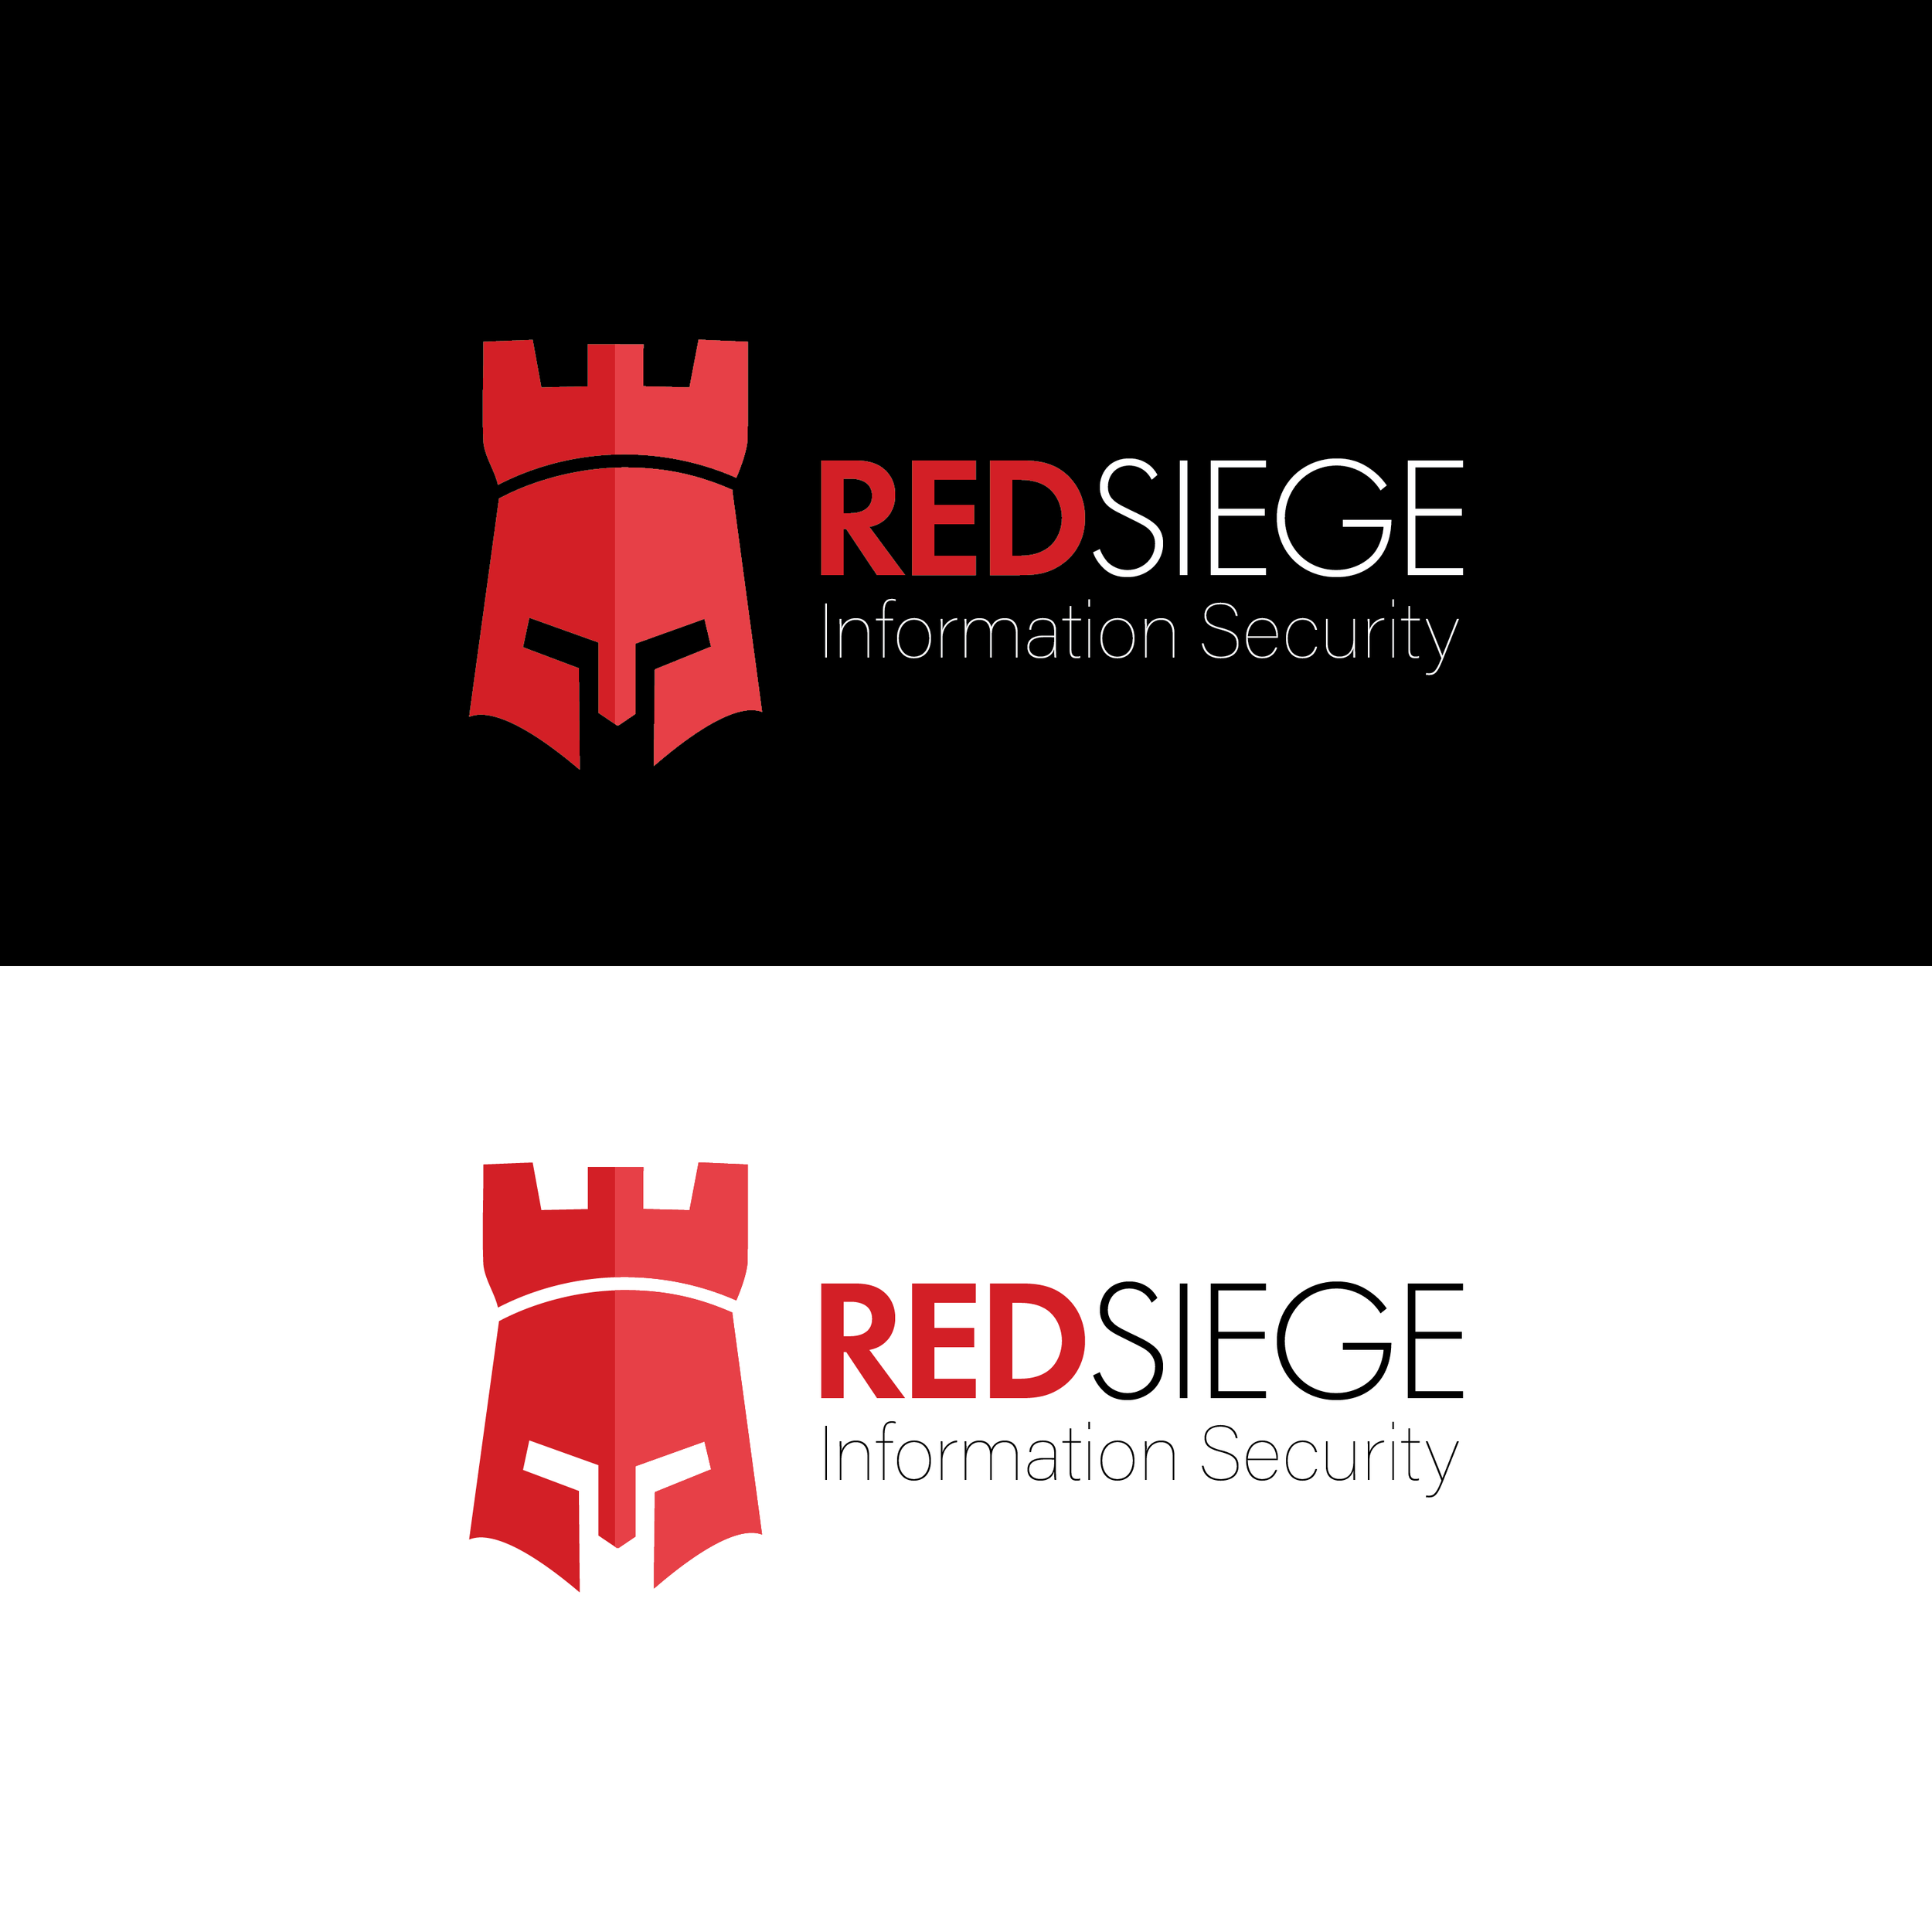 Red Siege Horizontal Primary Logo.